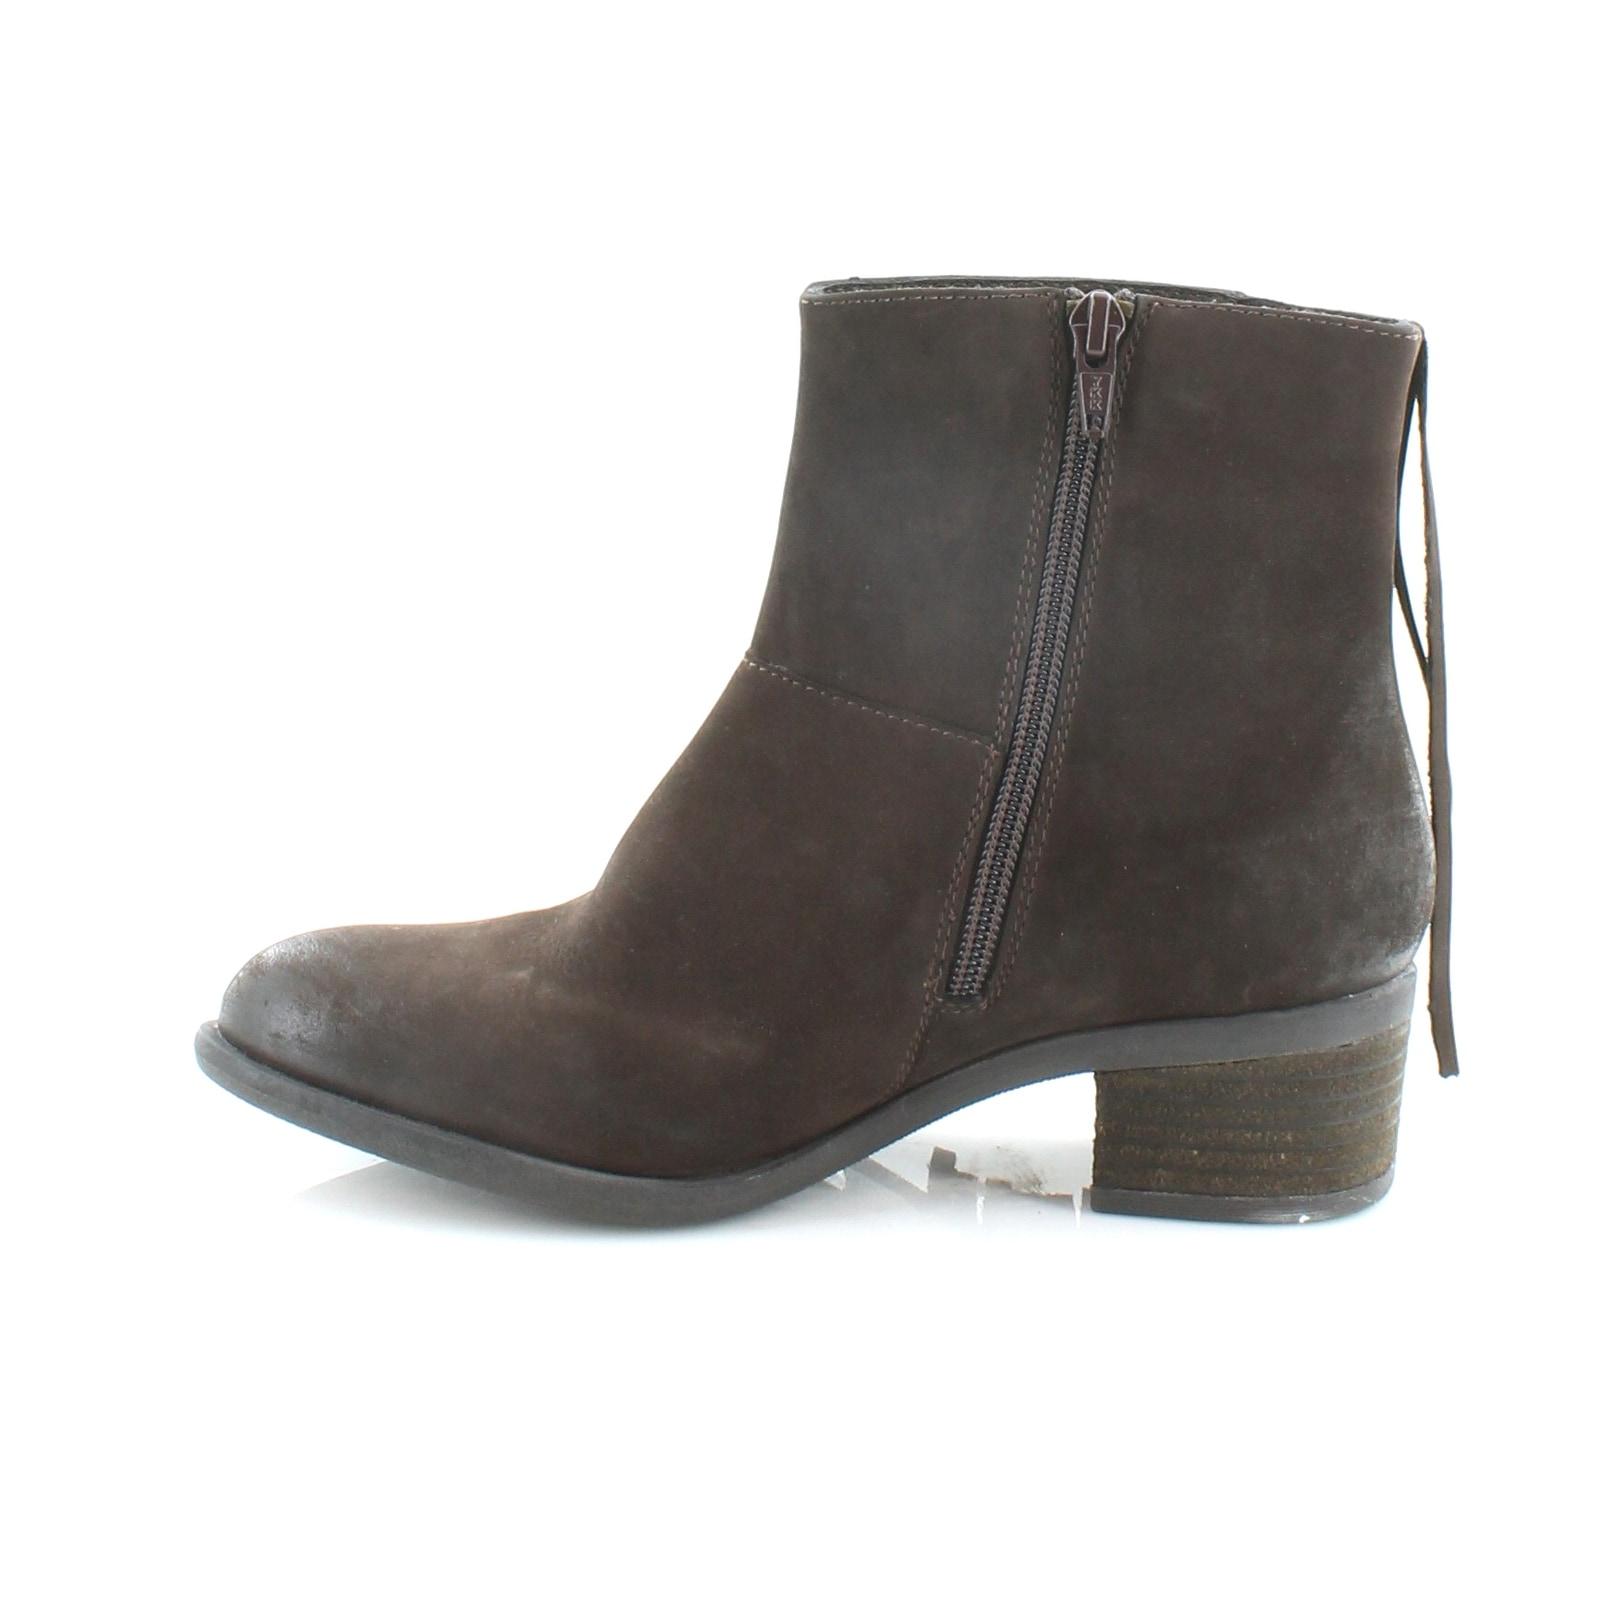 34aa05406b565 Steven by Steve Madden Casidyy Women's Boots Brown - 6